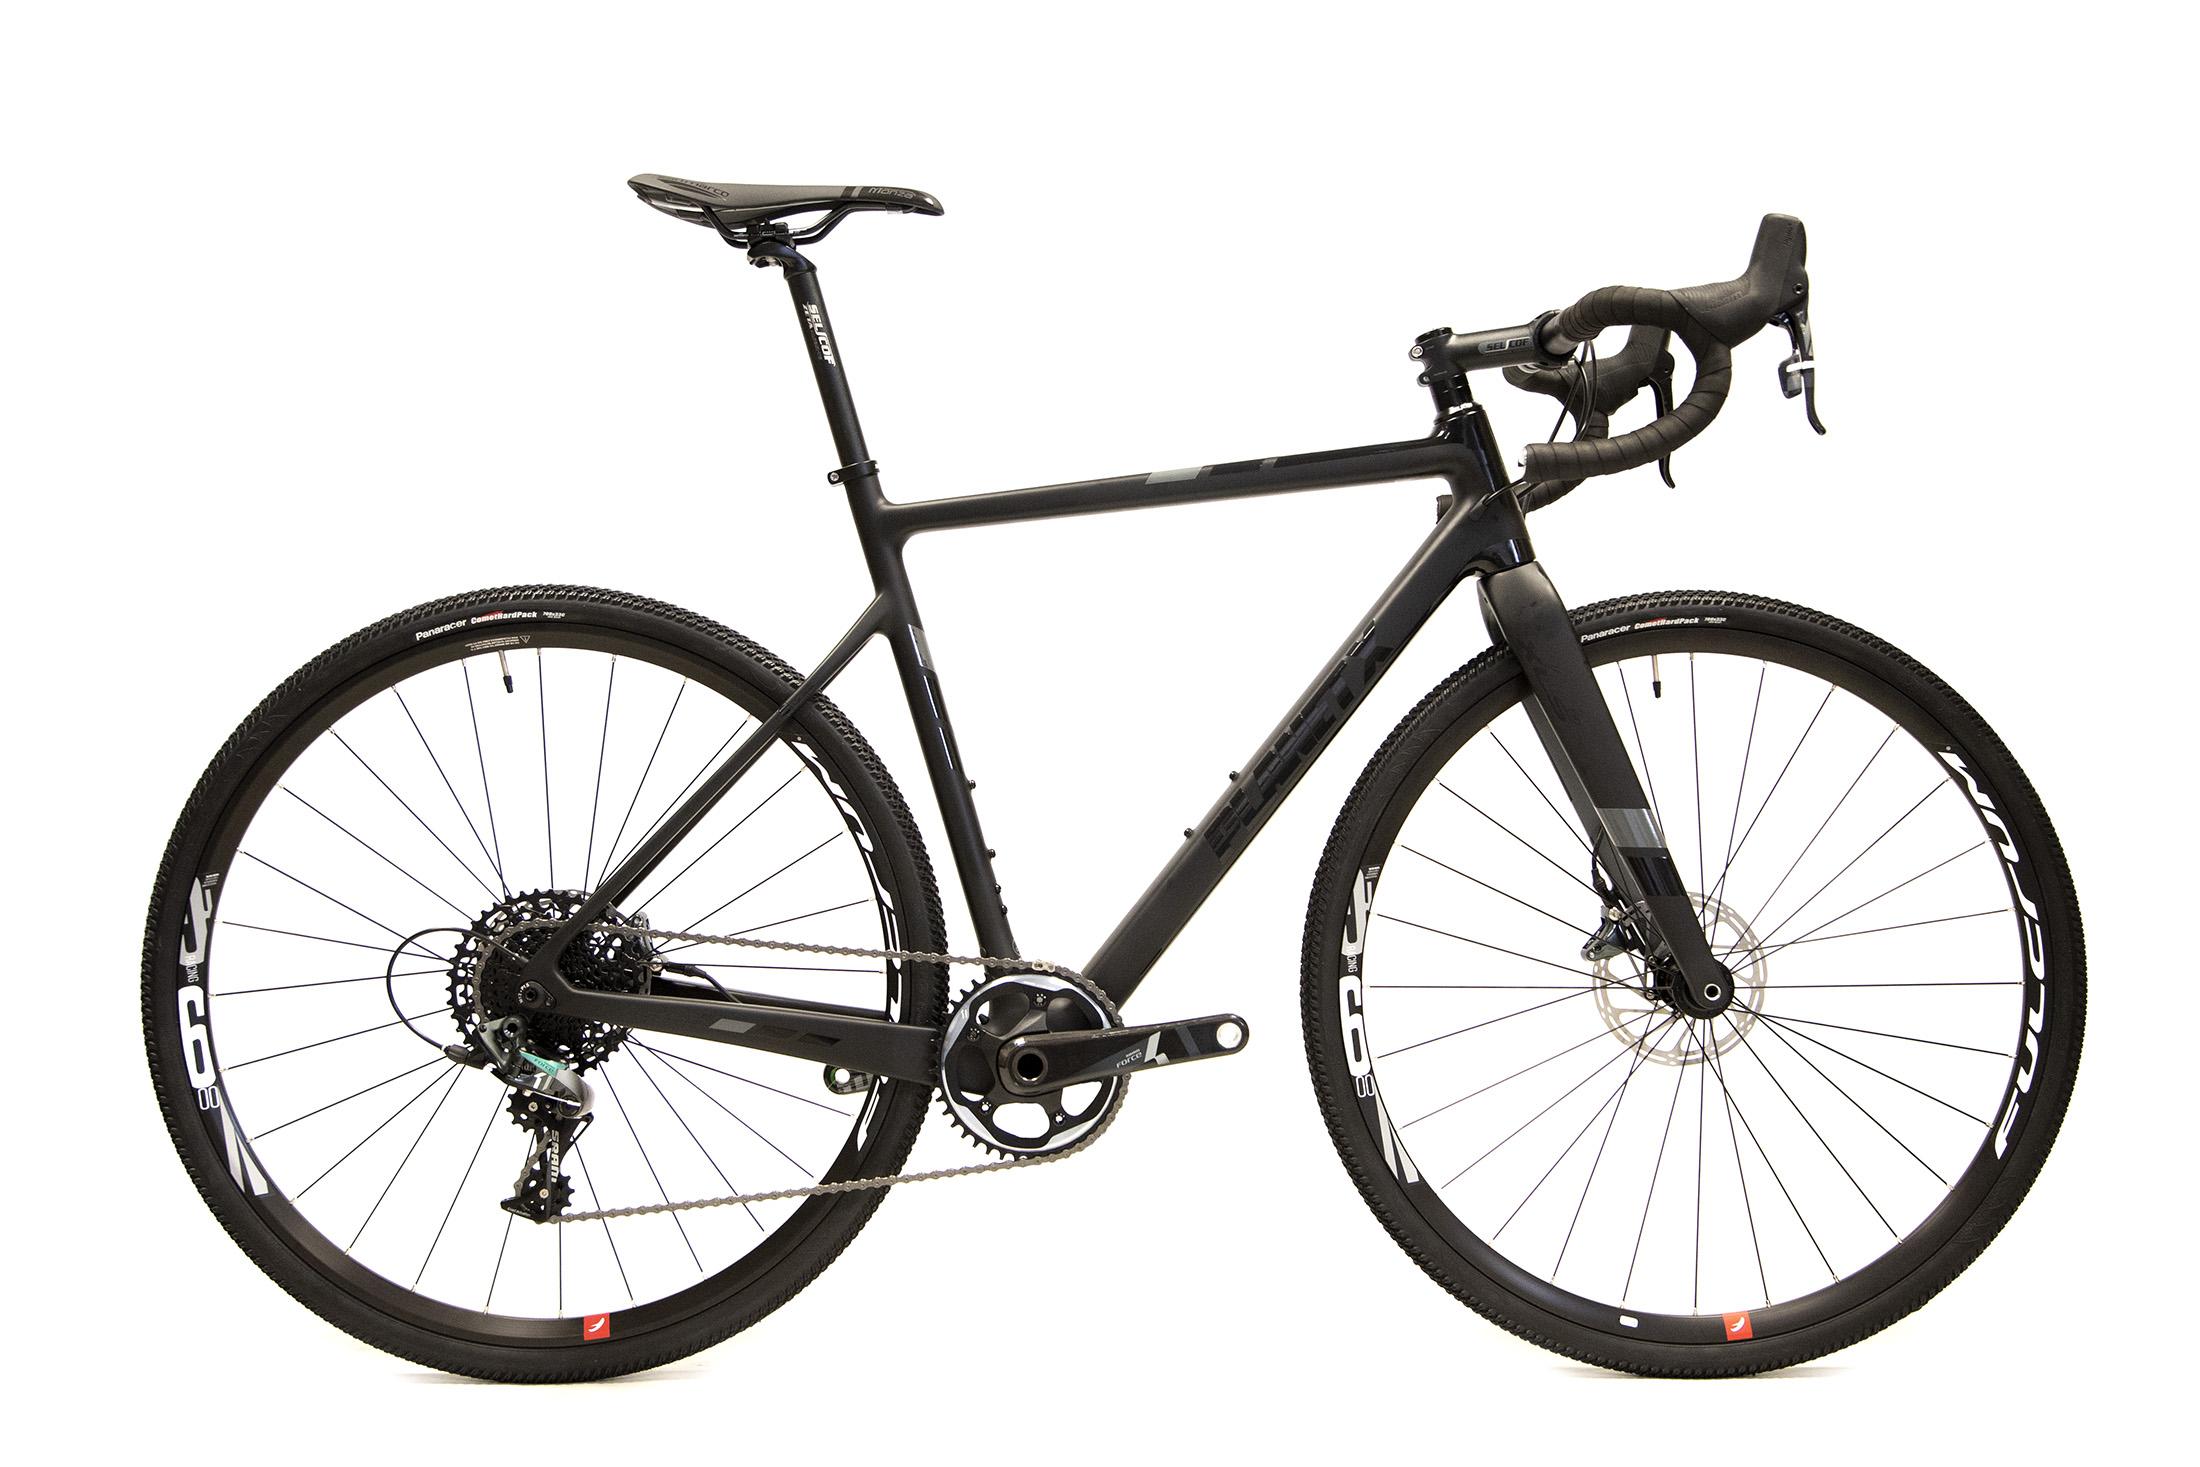 XLS-EVO Carbon Cyclocross Bike